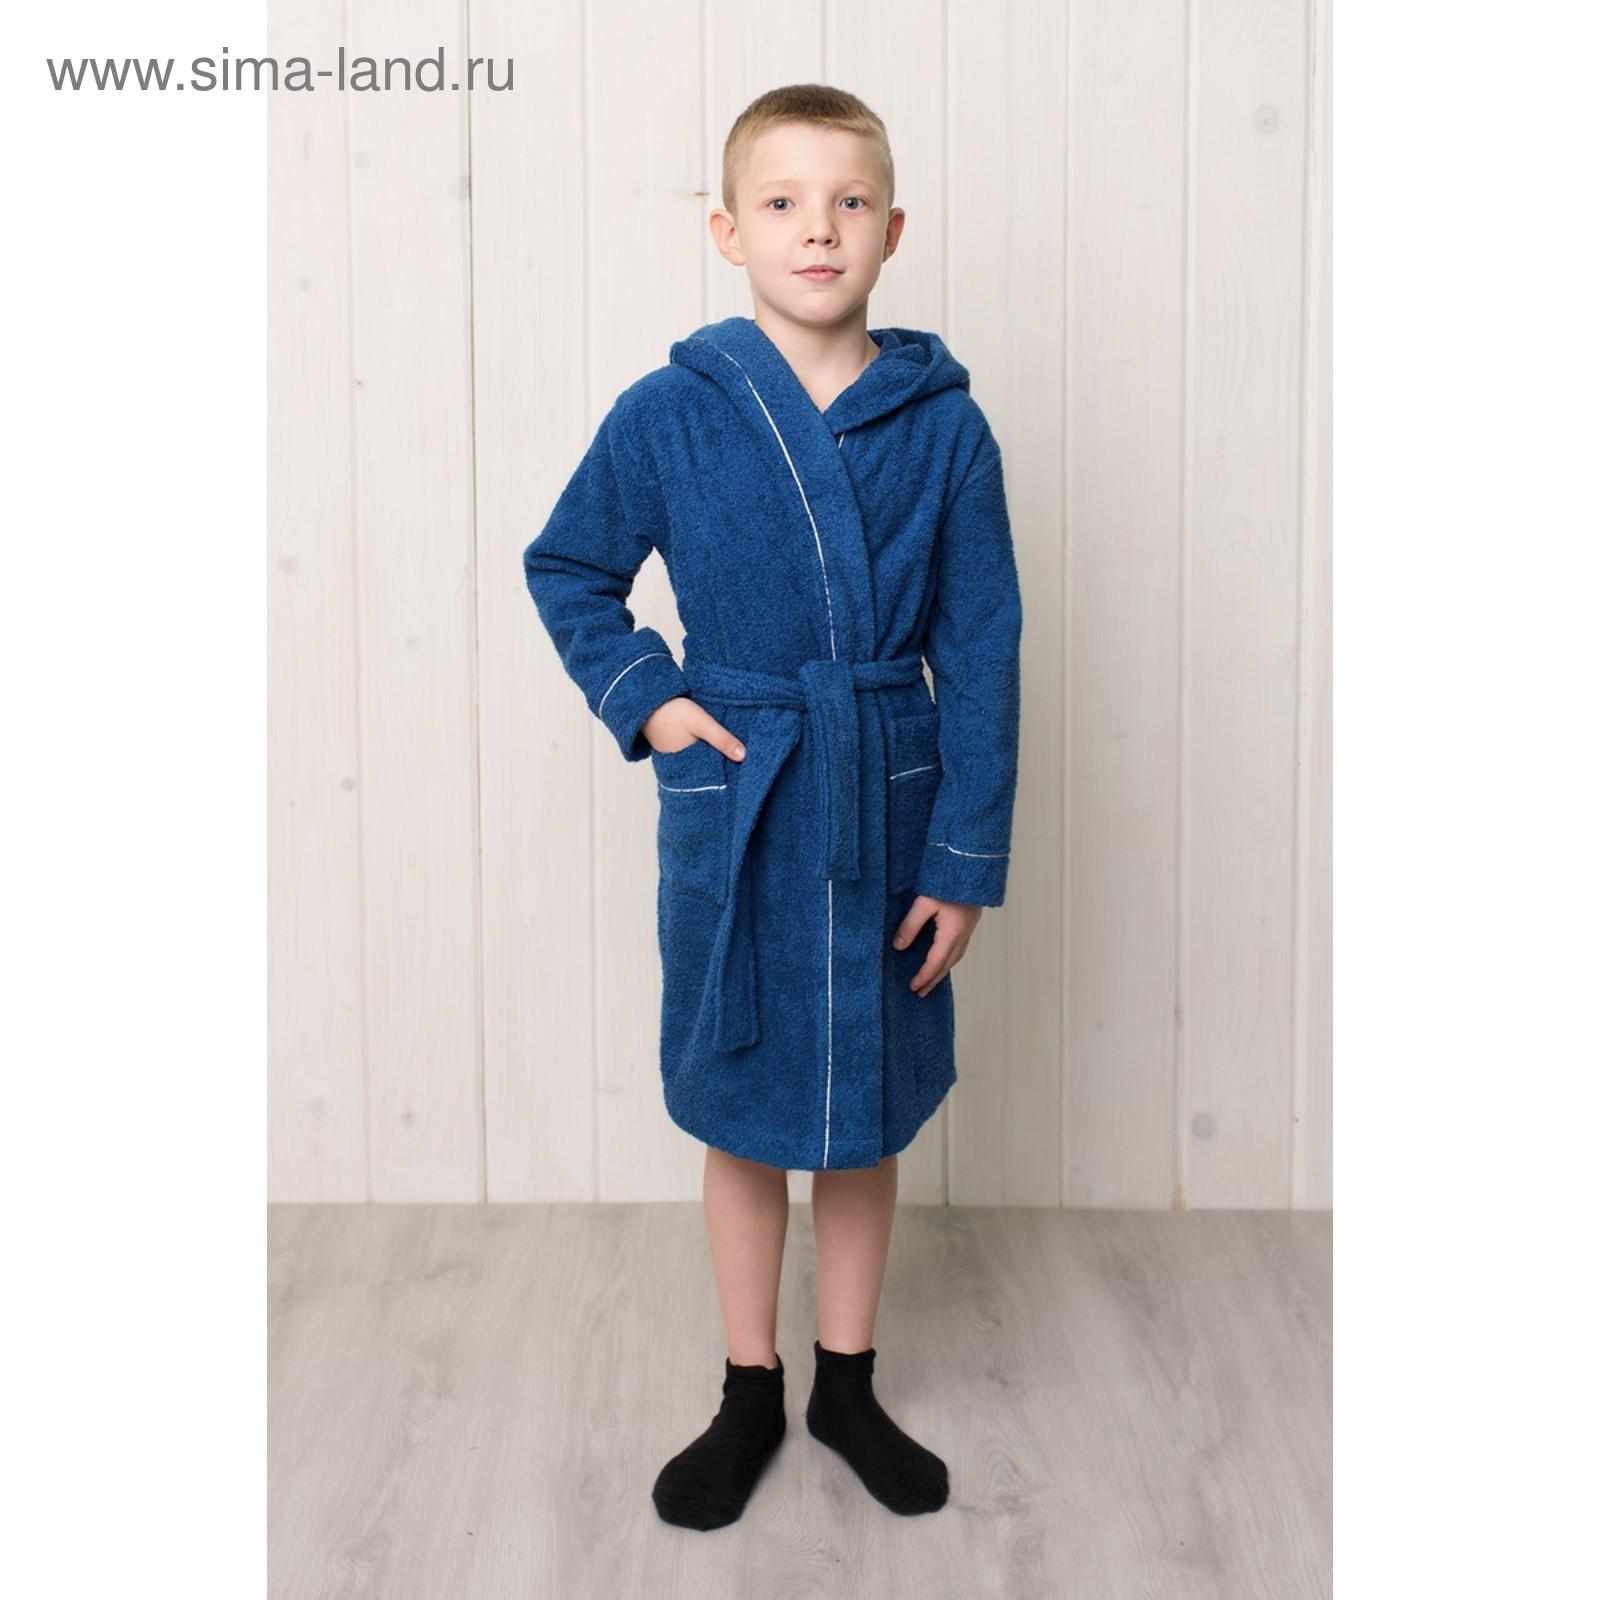 ae86009f9b1ea Халат для мальчика с капюшоном, рост 104 см, синий, махра (2168784 ...